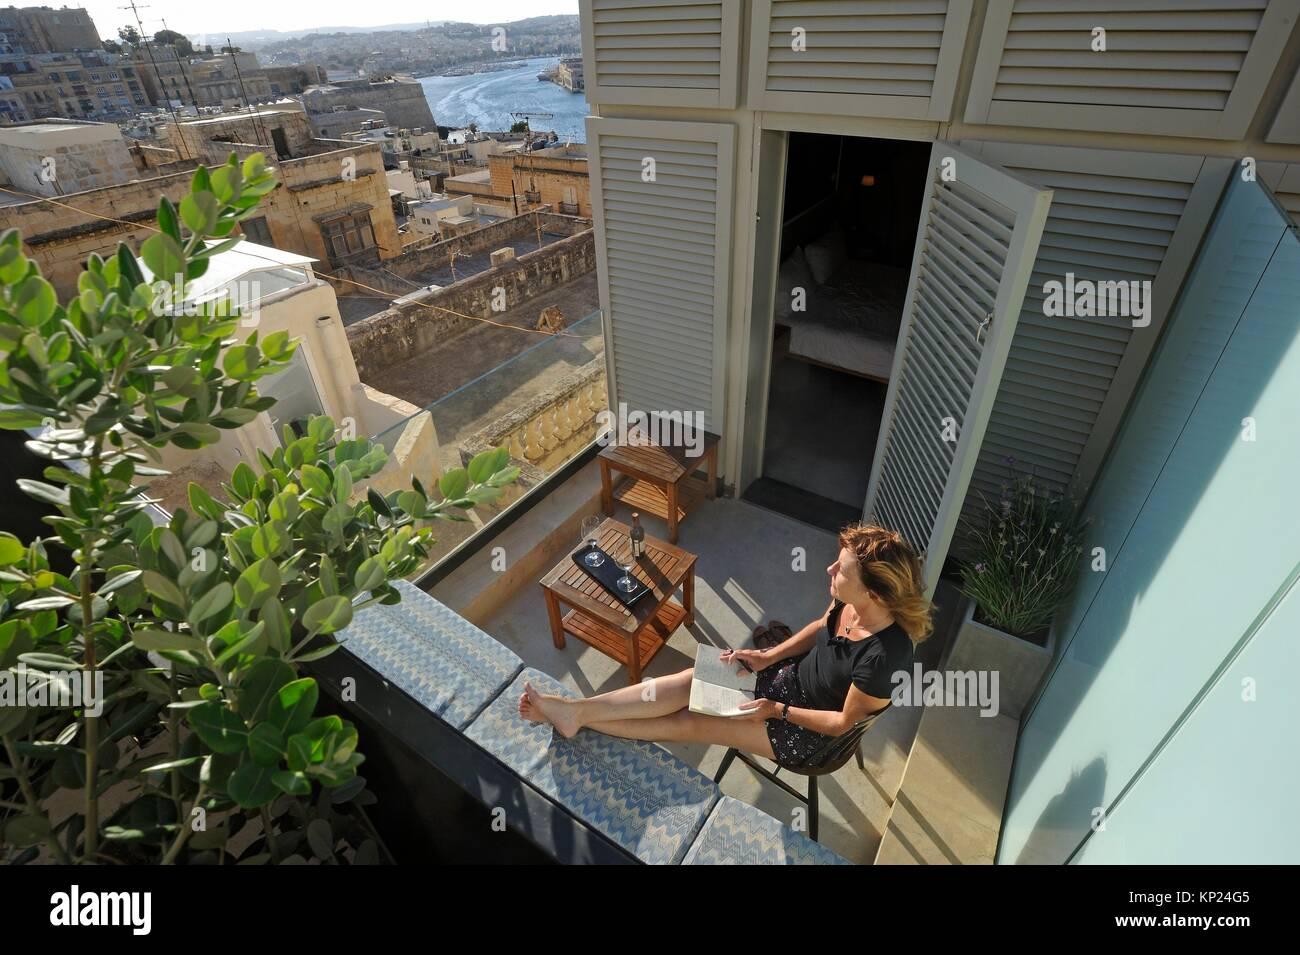 Casa Ellul Hotel, Old Theatre Street, Valletta, Malta, Southern Europe. - Stock Image